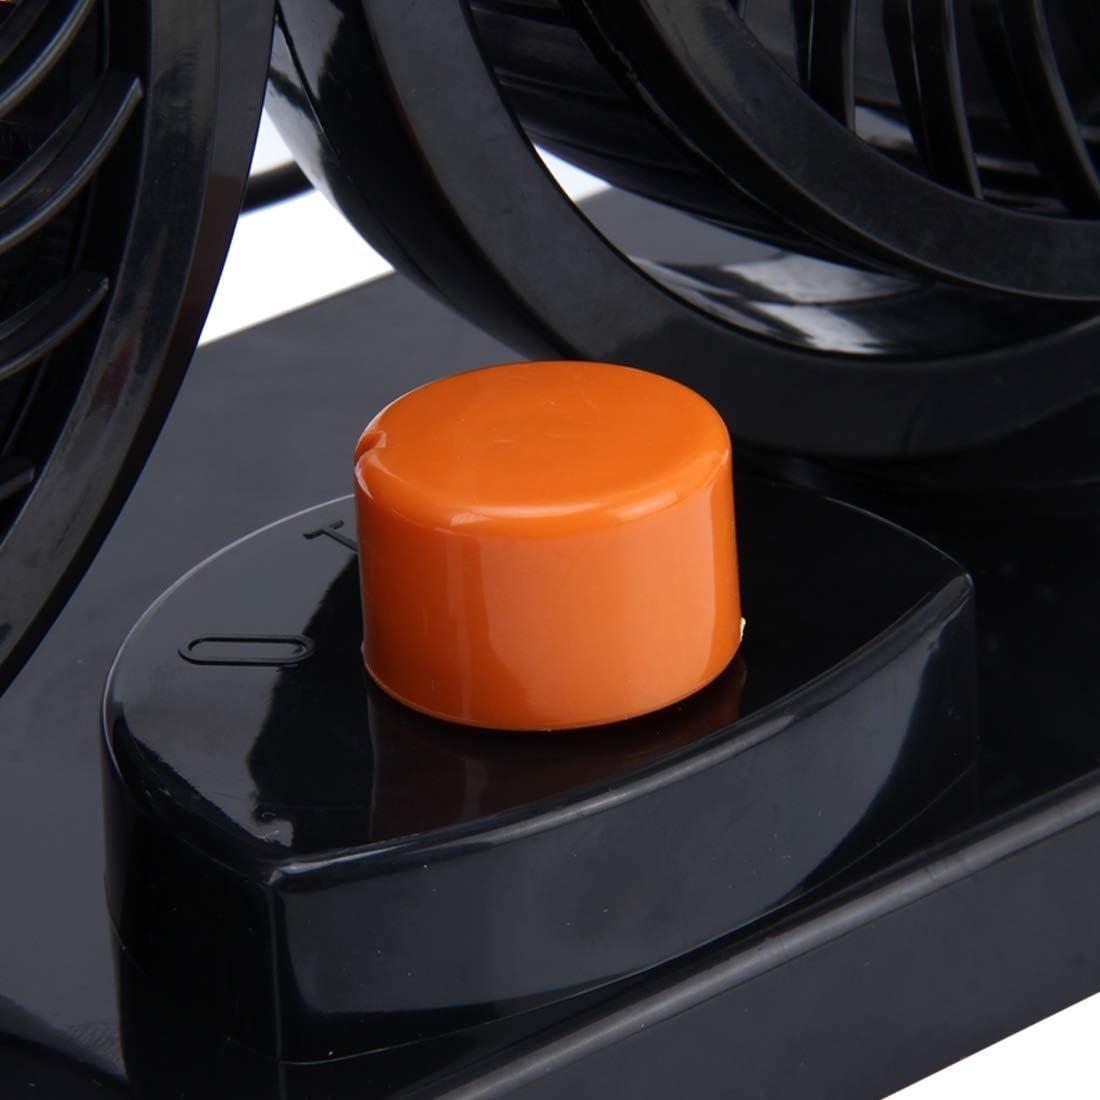 Creativity Trend Sunshine Modern USB Fan Desk Lamp HUXIN HX-T303 6.5W 360 Degree Adjustable Rotation Two Head Low Noise Mini Electric Car Fan DC12V Fashion Safety and Environmental pr